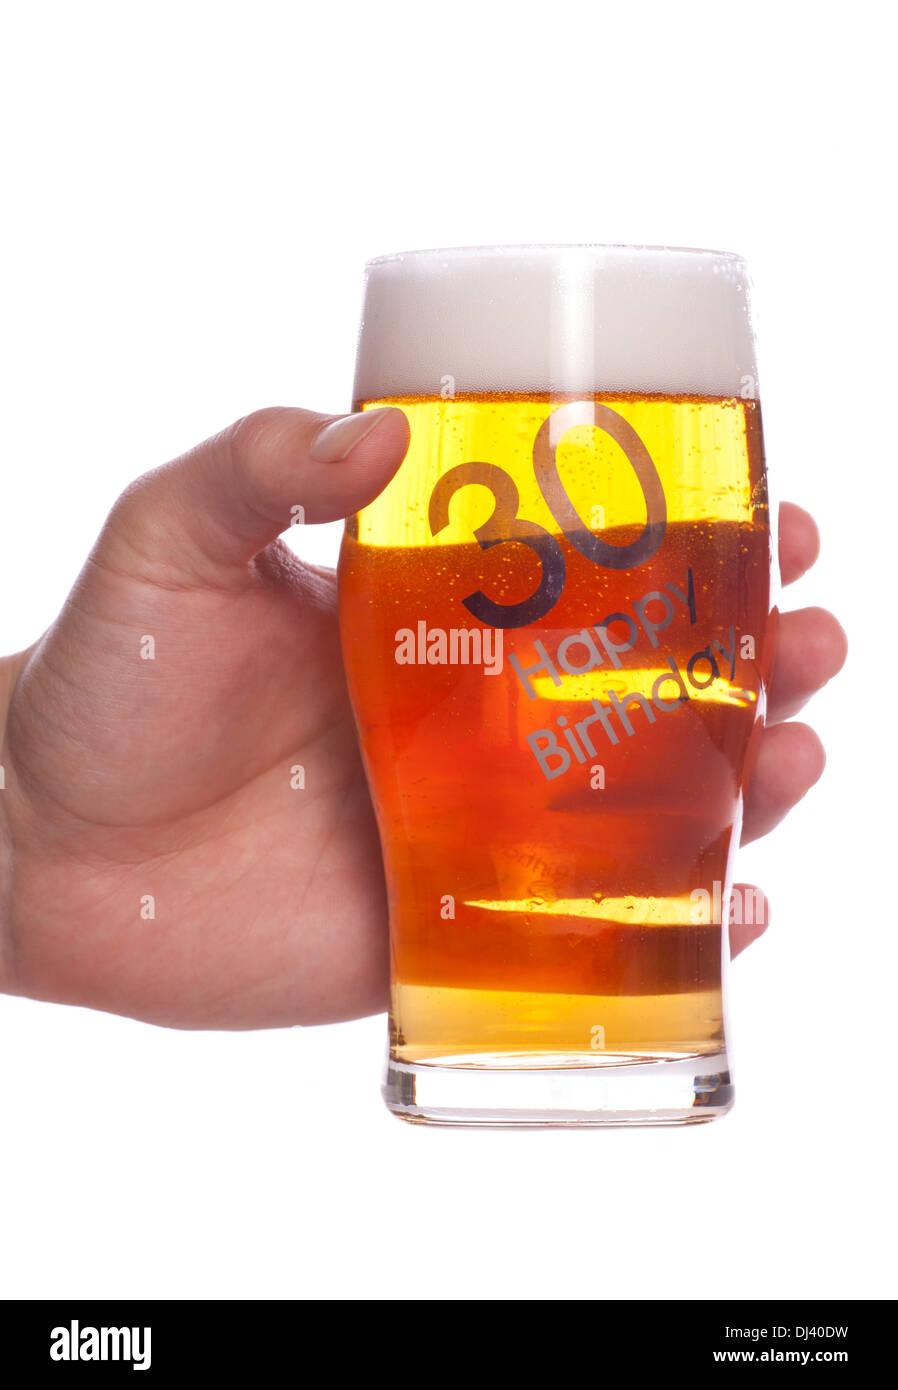 30 Geburtstag Bier Feier Studio Ausschnitt Stockfoto Bild